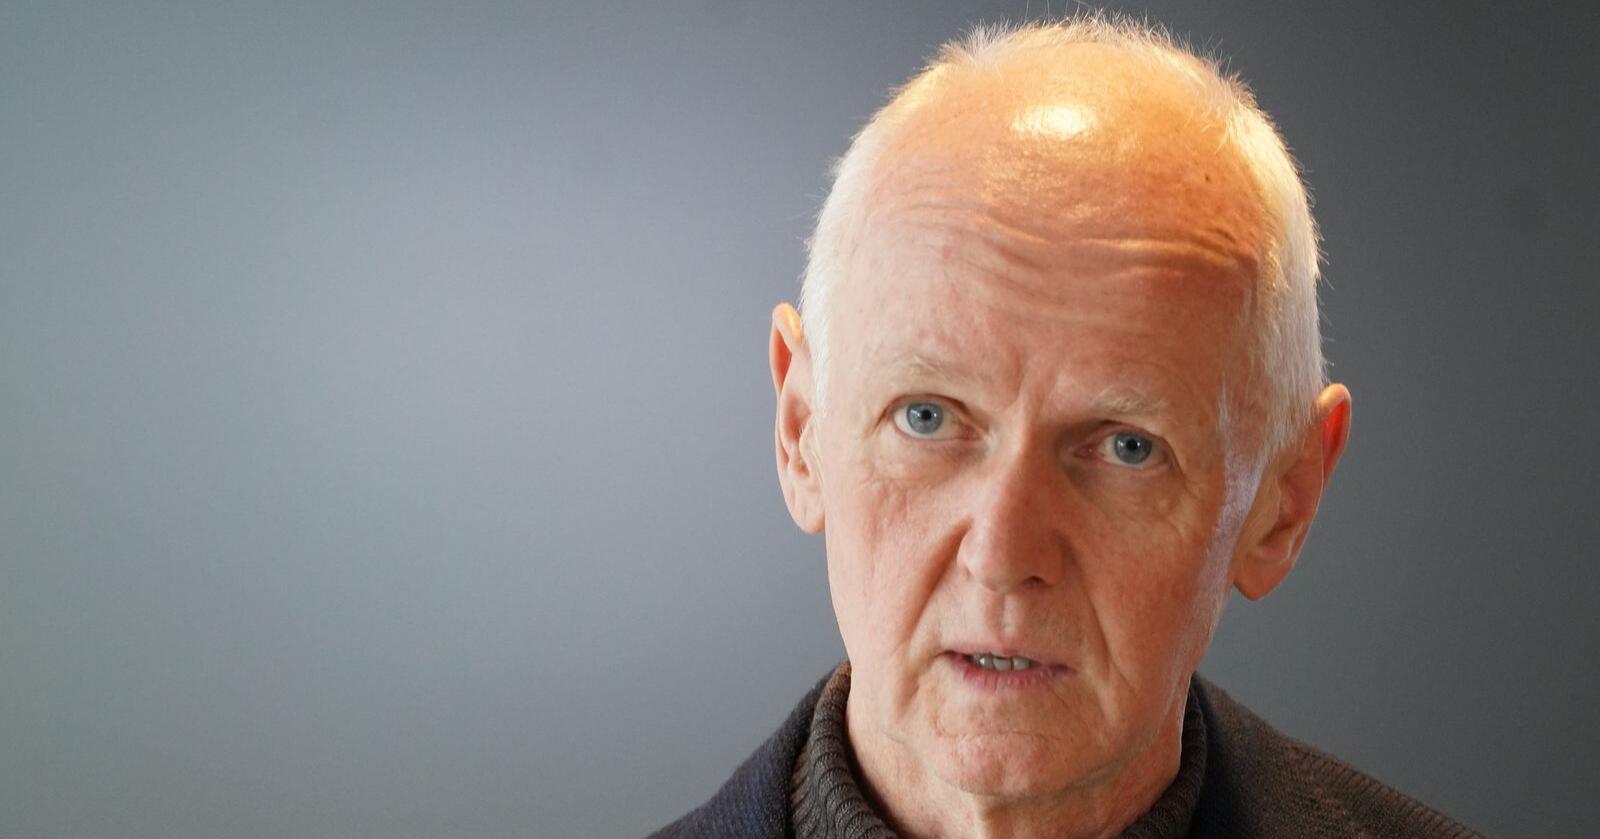 Områdedirektør Geir Bukholm i Folkehelseinstituttet. Foto: Ole Berg-Rusten / NTB